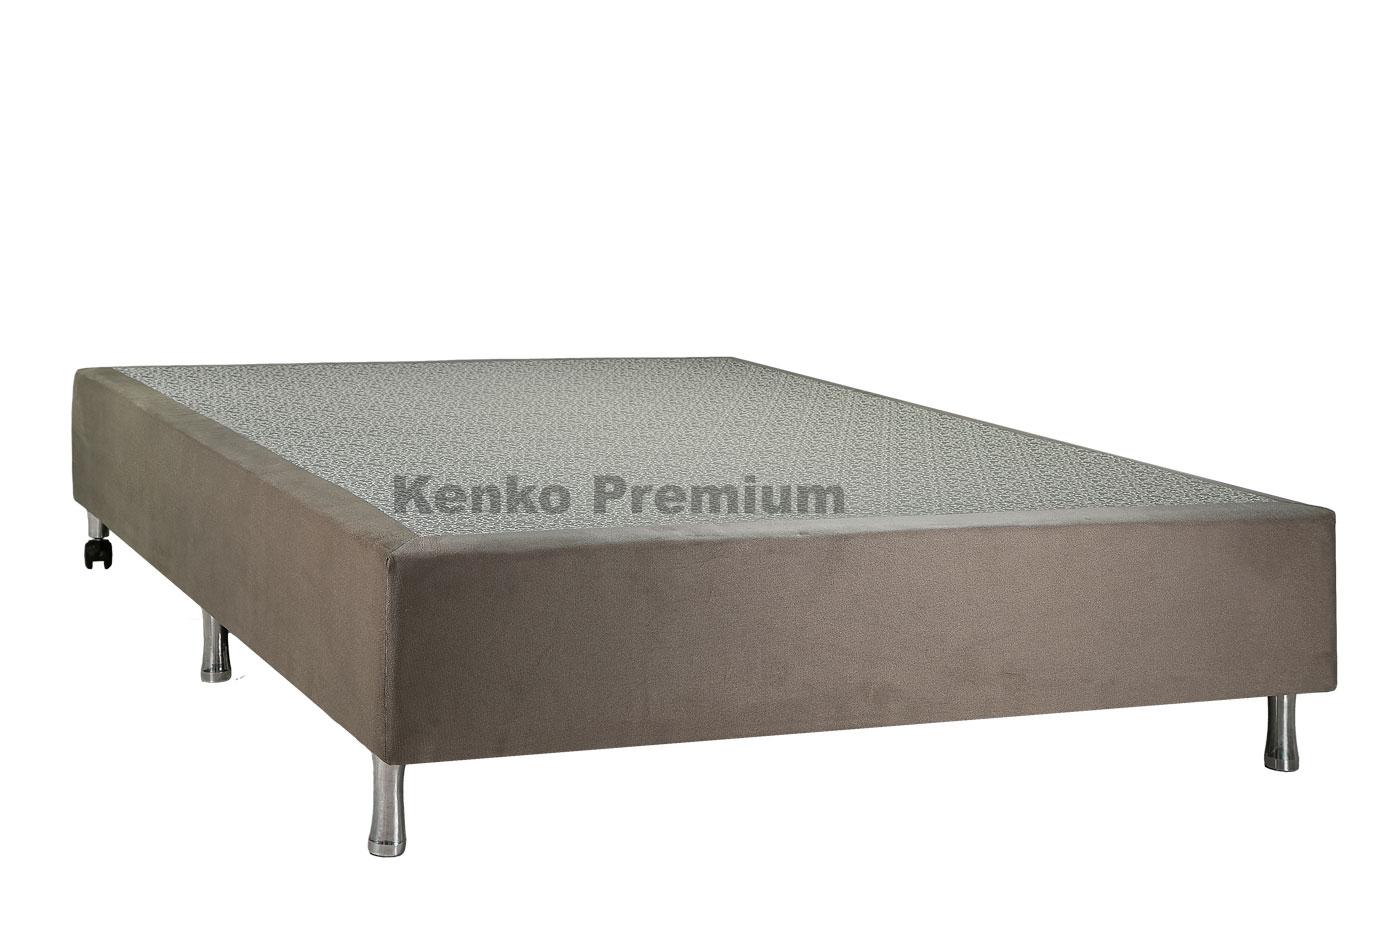 Box Base Para Colchão King Size Suede 1,93x2,03 Kenko Premium  - Kenko Premium Colchões